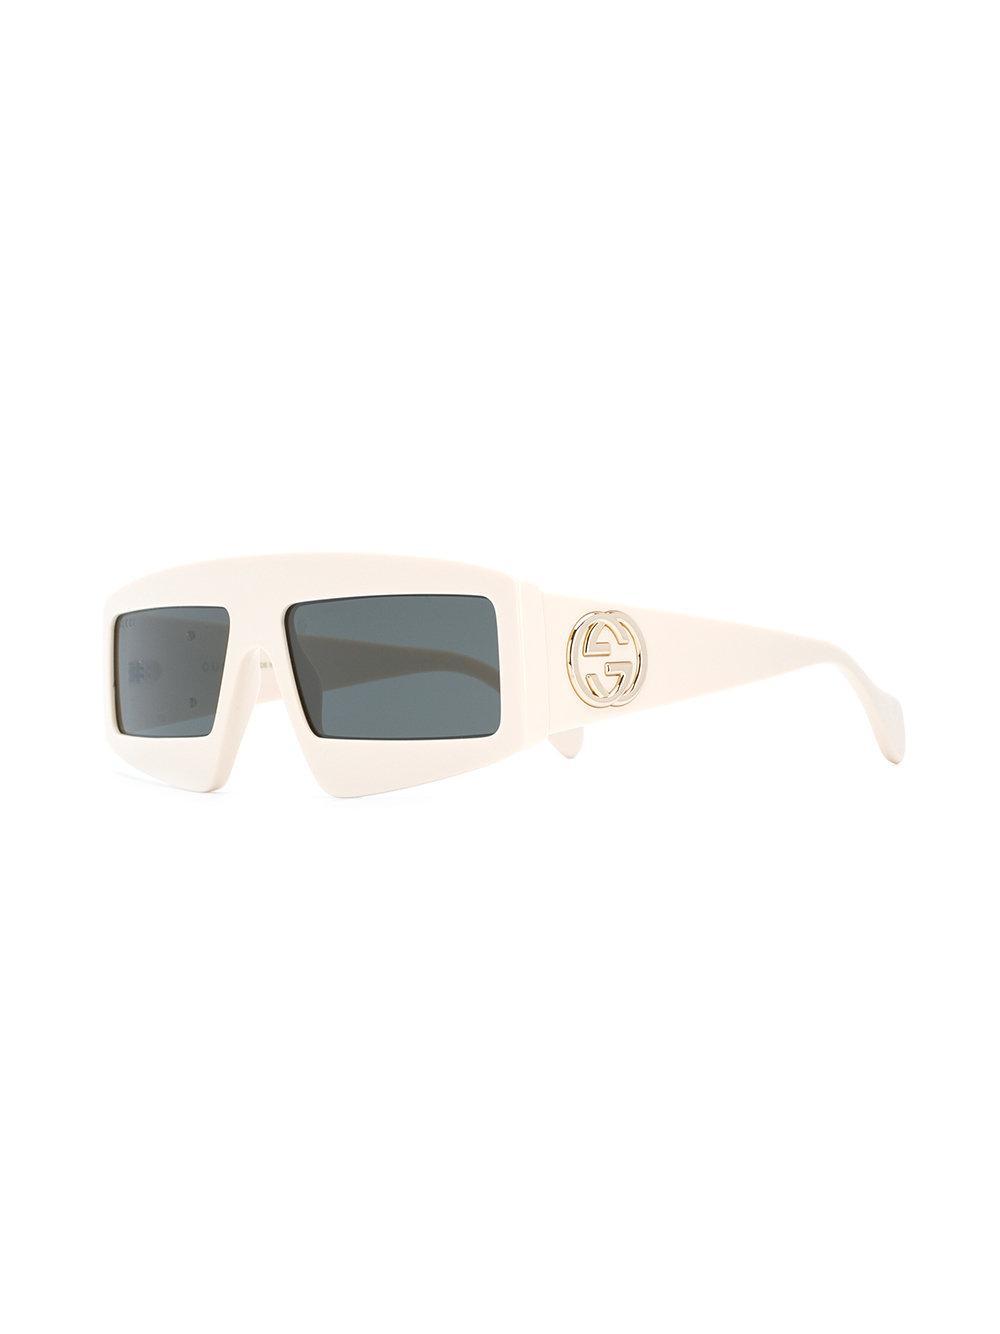 569afb3a28 Gucci Square Frame Sunglasses in White - Lyst